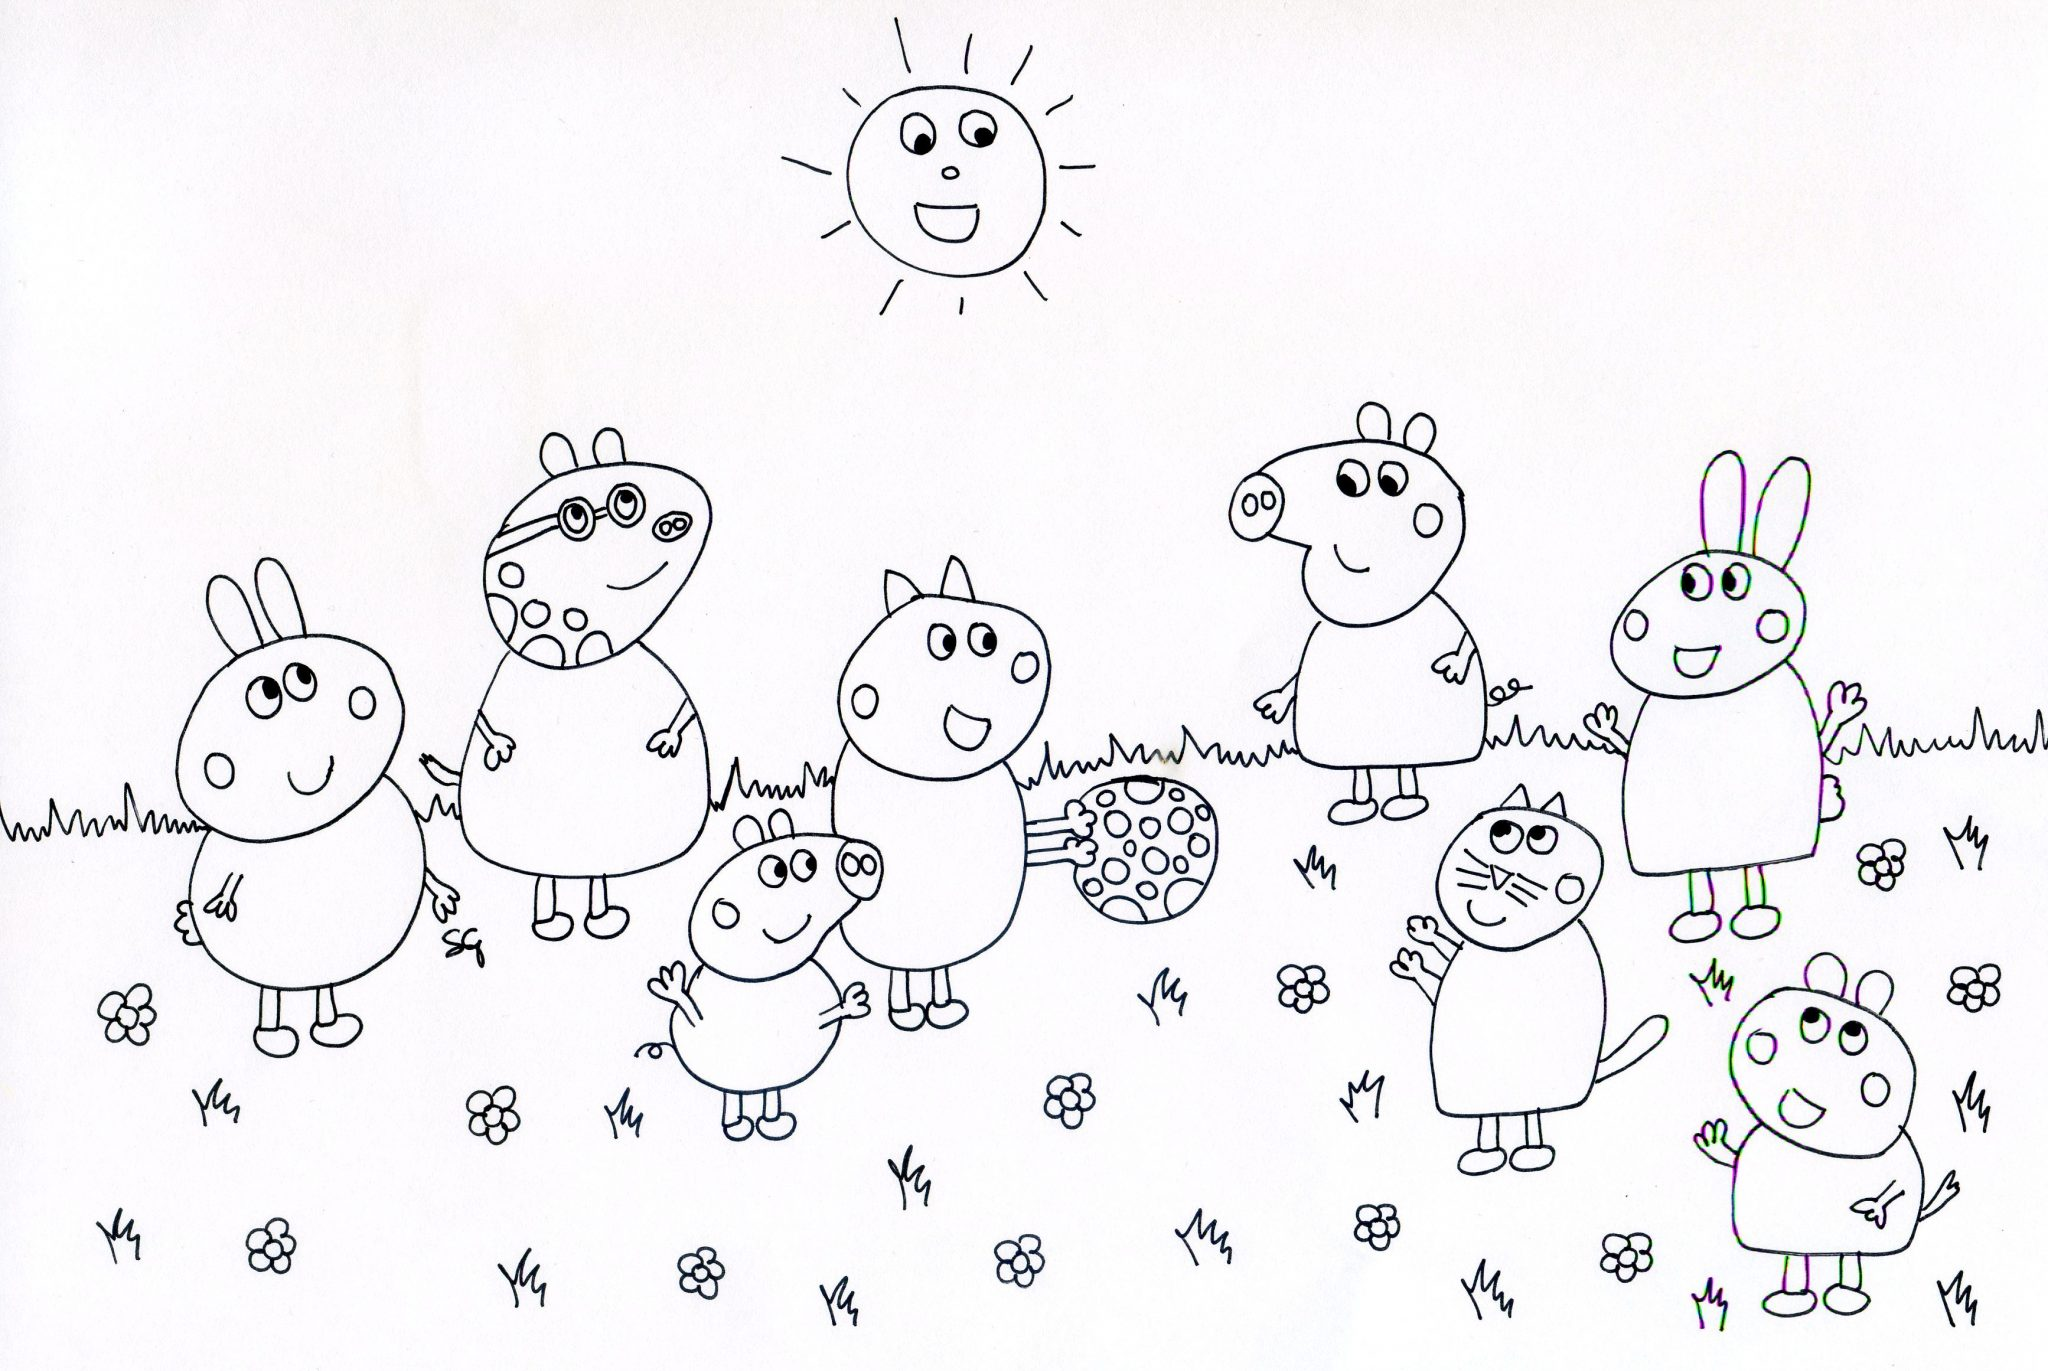 peppa pig immagini da colorare